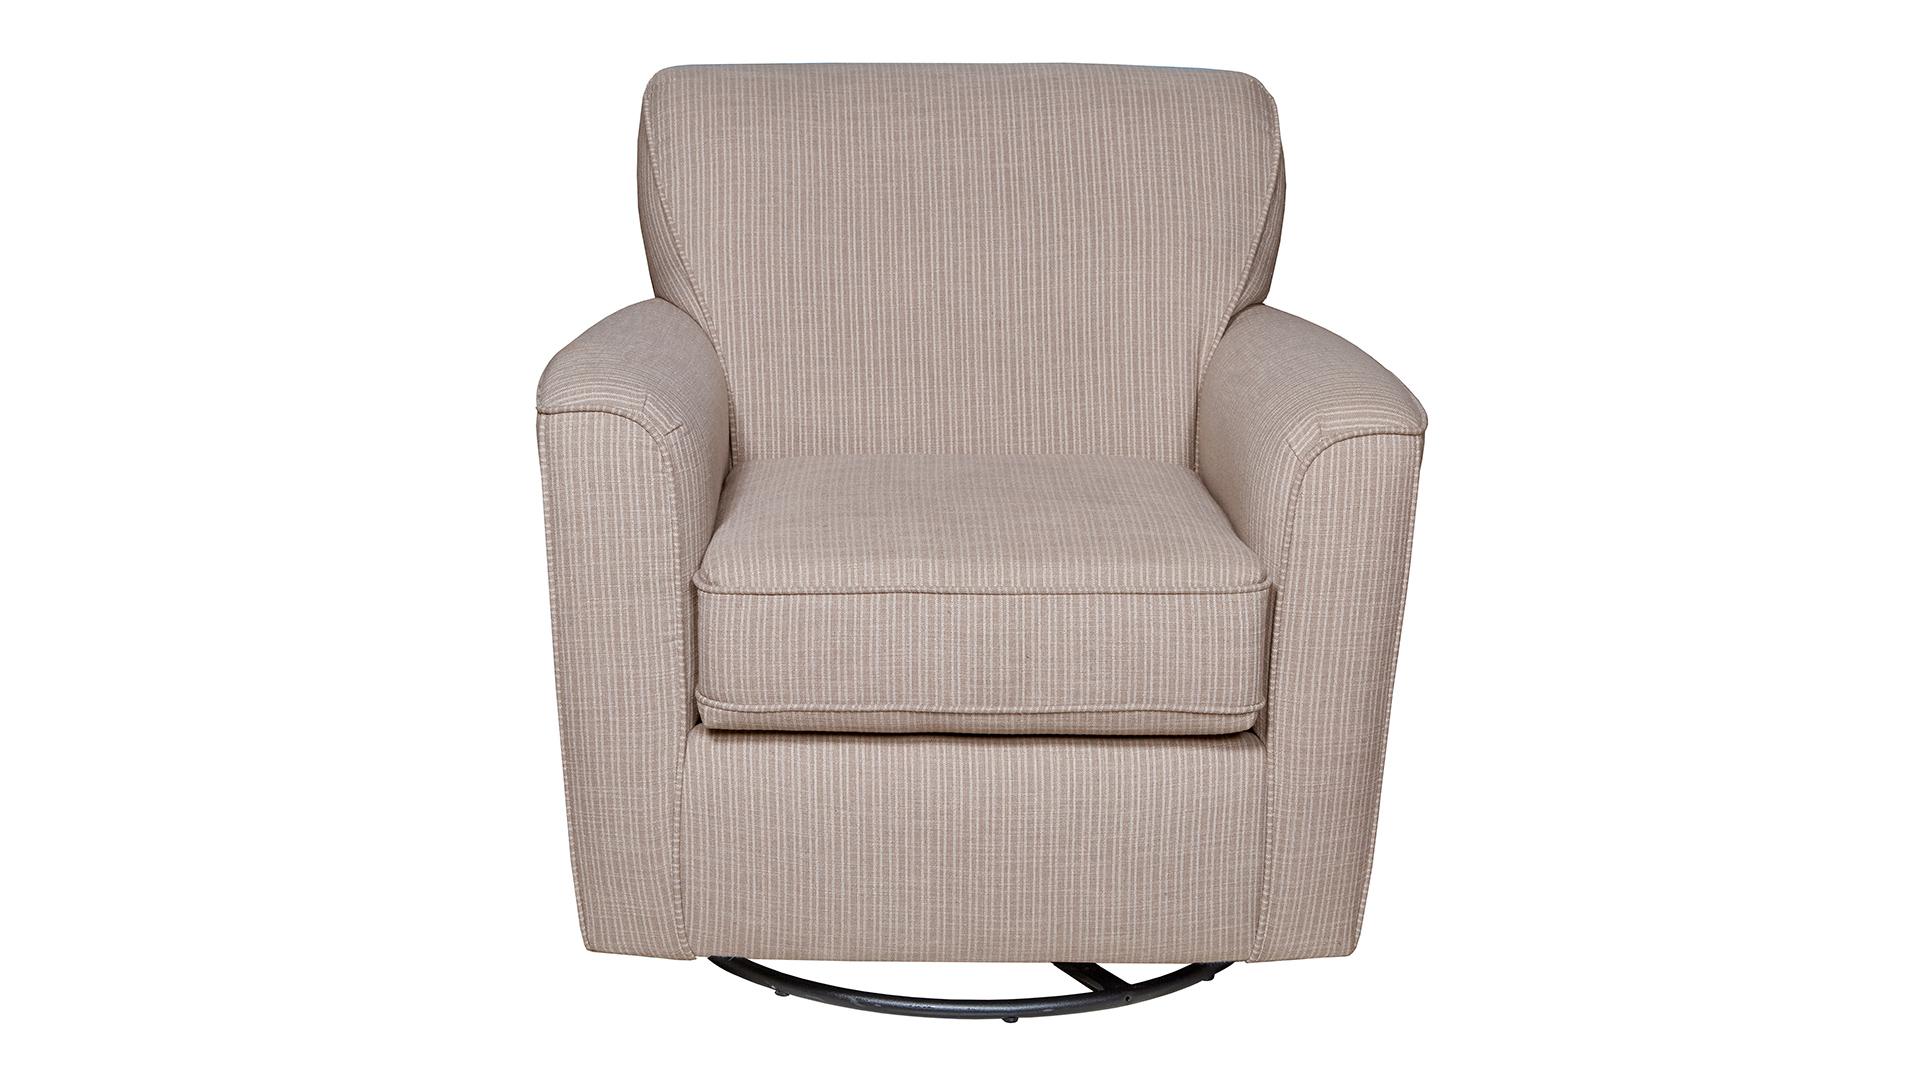 Awe Inspiring Kaylee Pebble Swivel Chair Machost Co Dining Chair Design Ideas Machostcouk